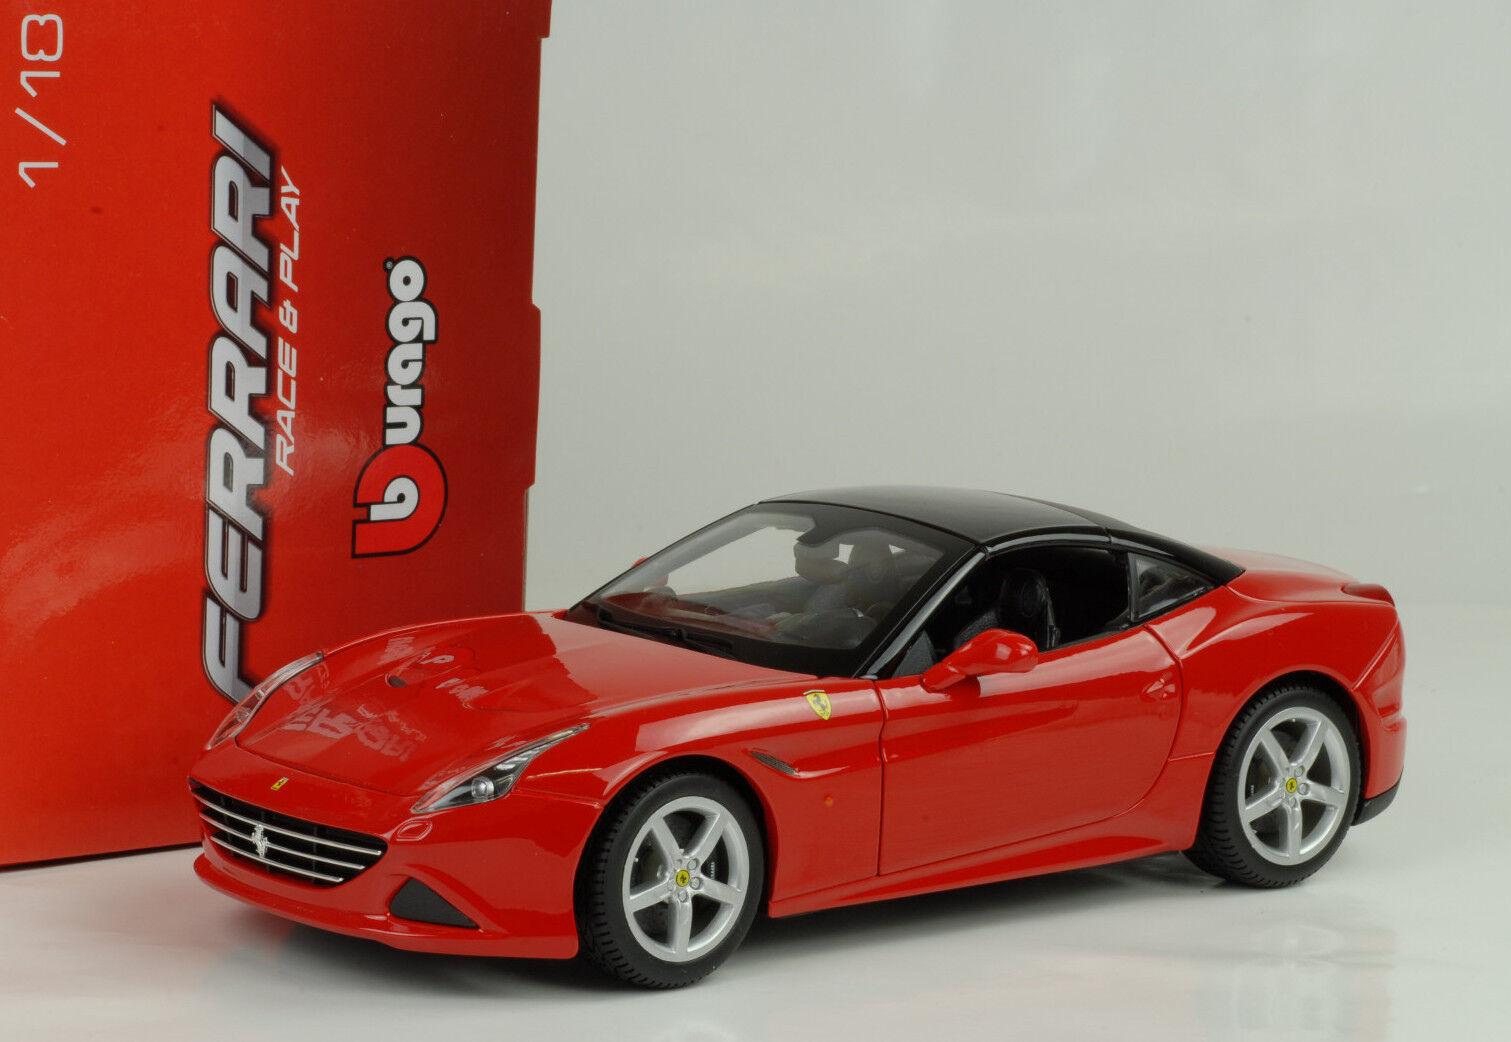 n ° 1 en línea 2014 Ferrari California T Hardtop rojo Rojo 1 18 Bburago Bburago Bburago  ahorra hasta un 50%